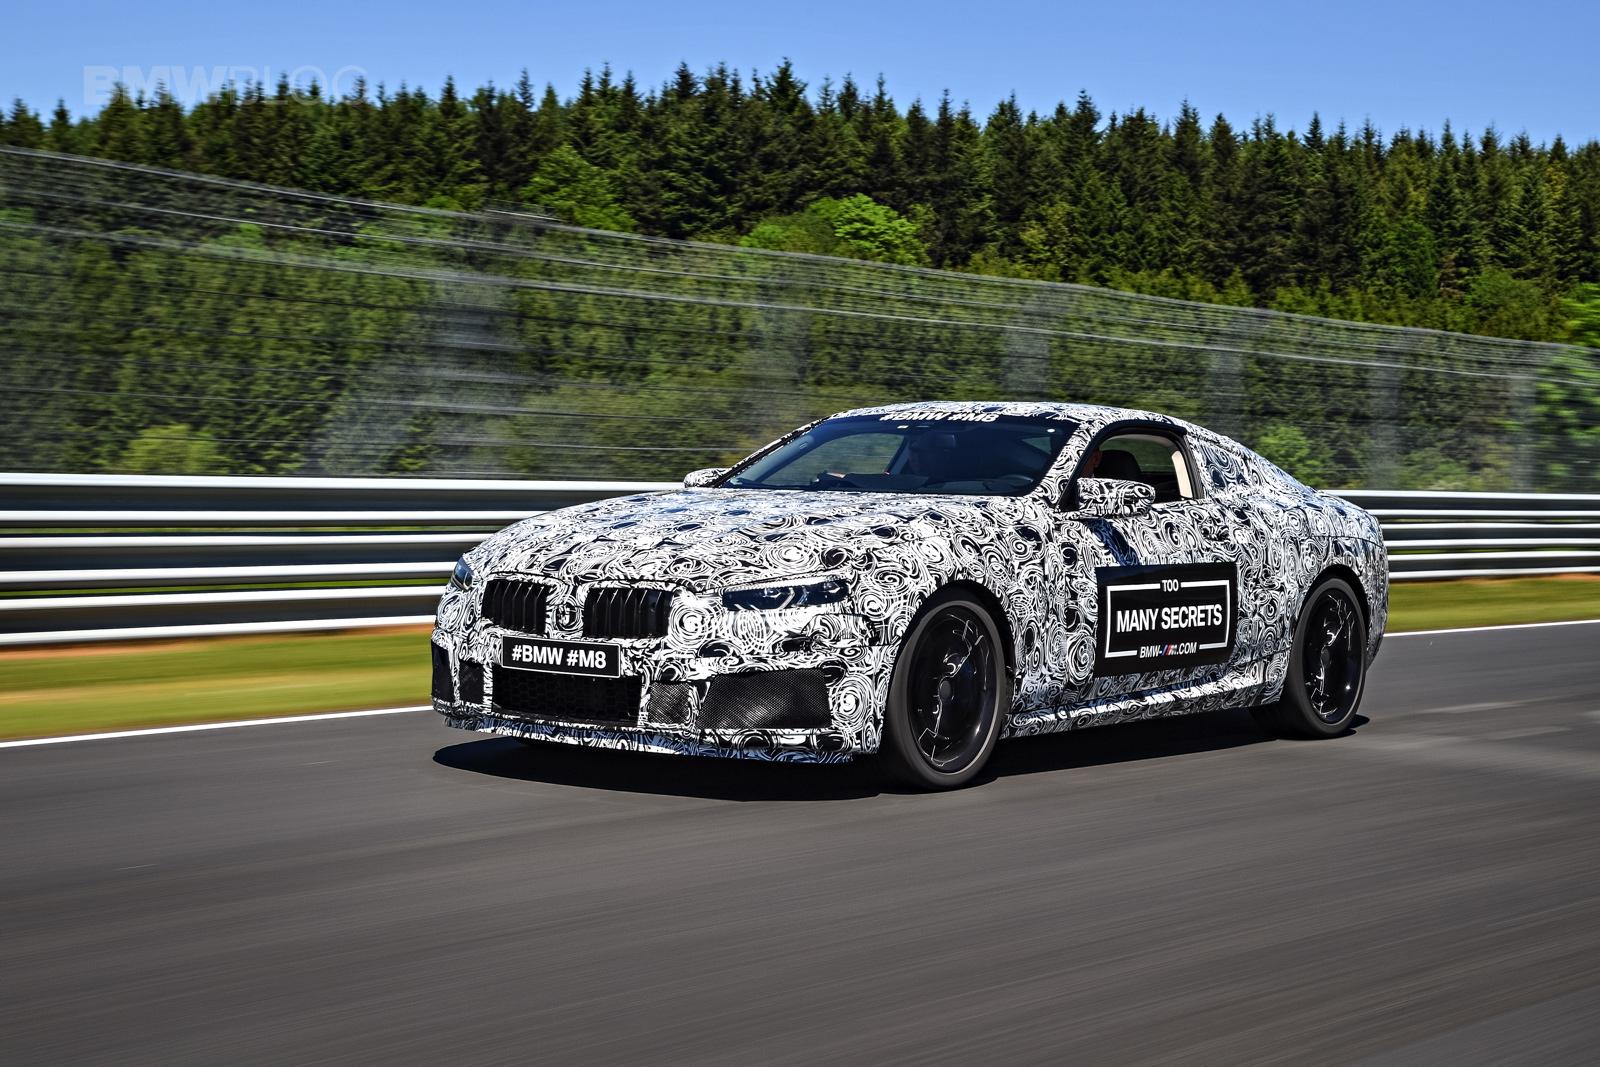 BMW M8 photos camouflage 15